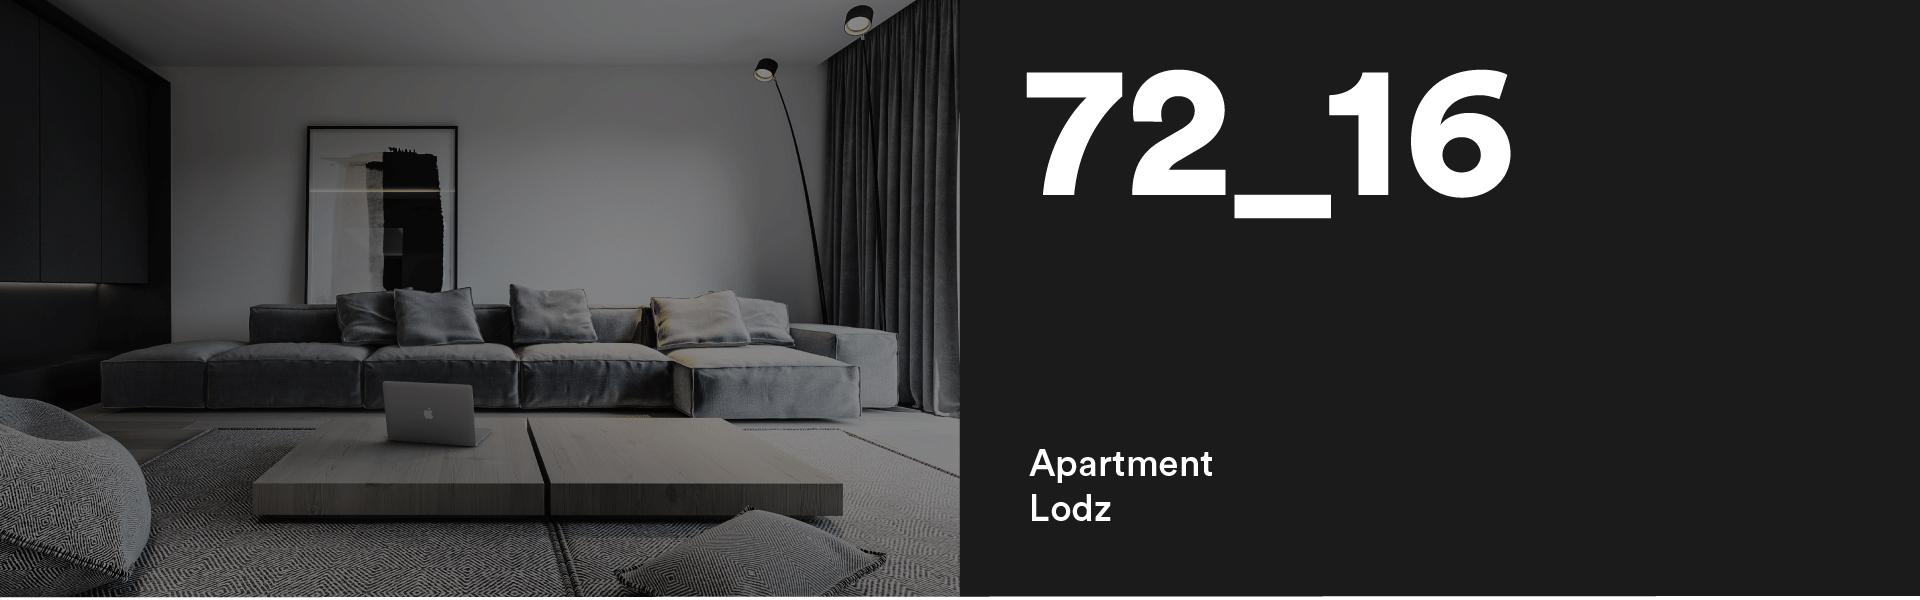 72_16 Apartment Lodz